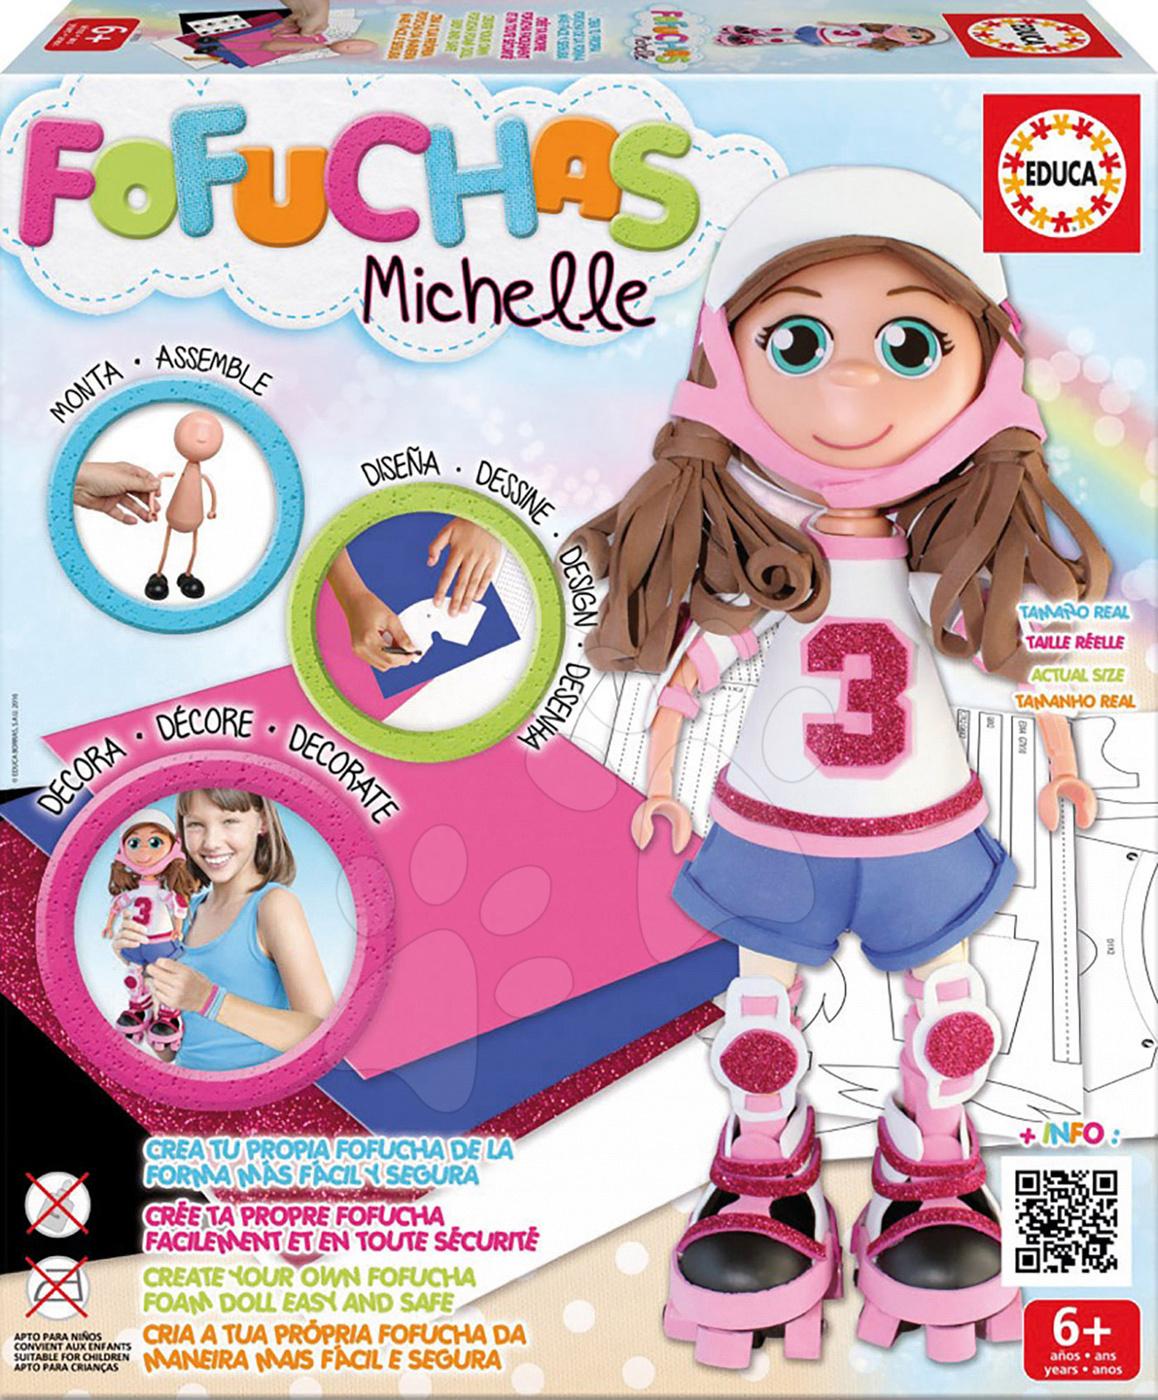 Stylová panenka Fofuchas bruslařka Michelle Educa Obleč ji sama od 6 let